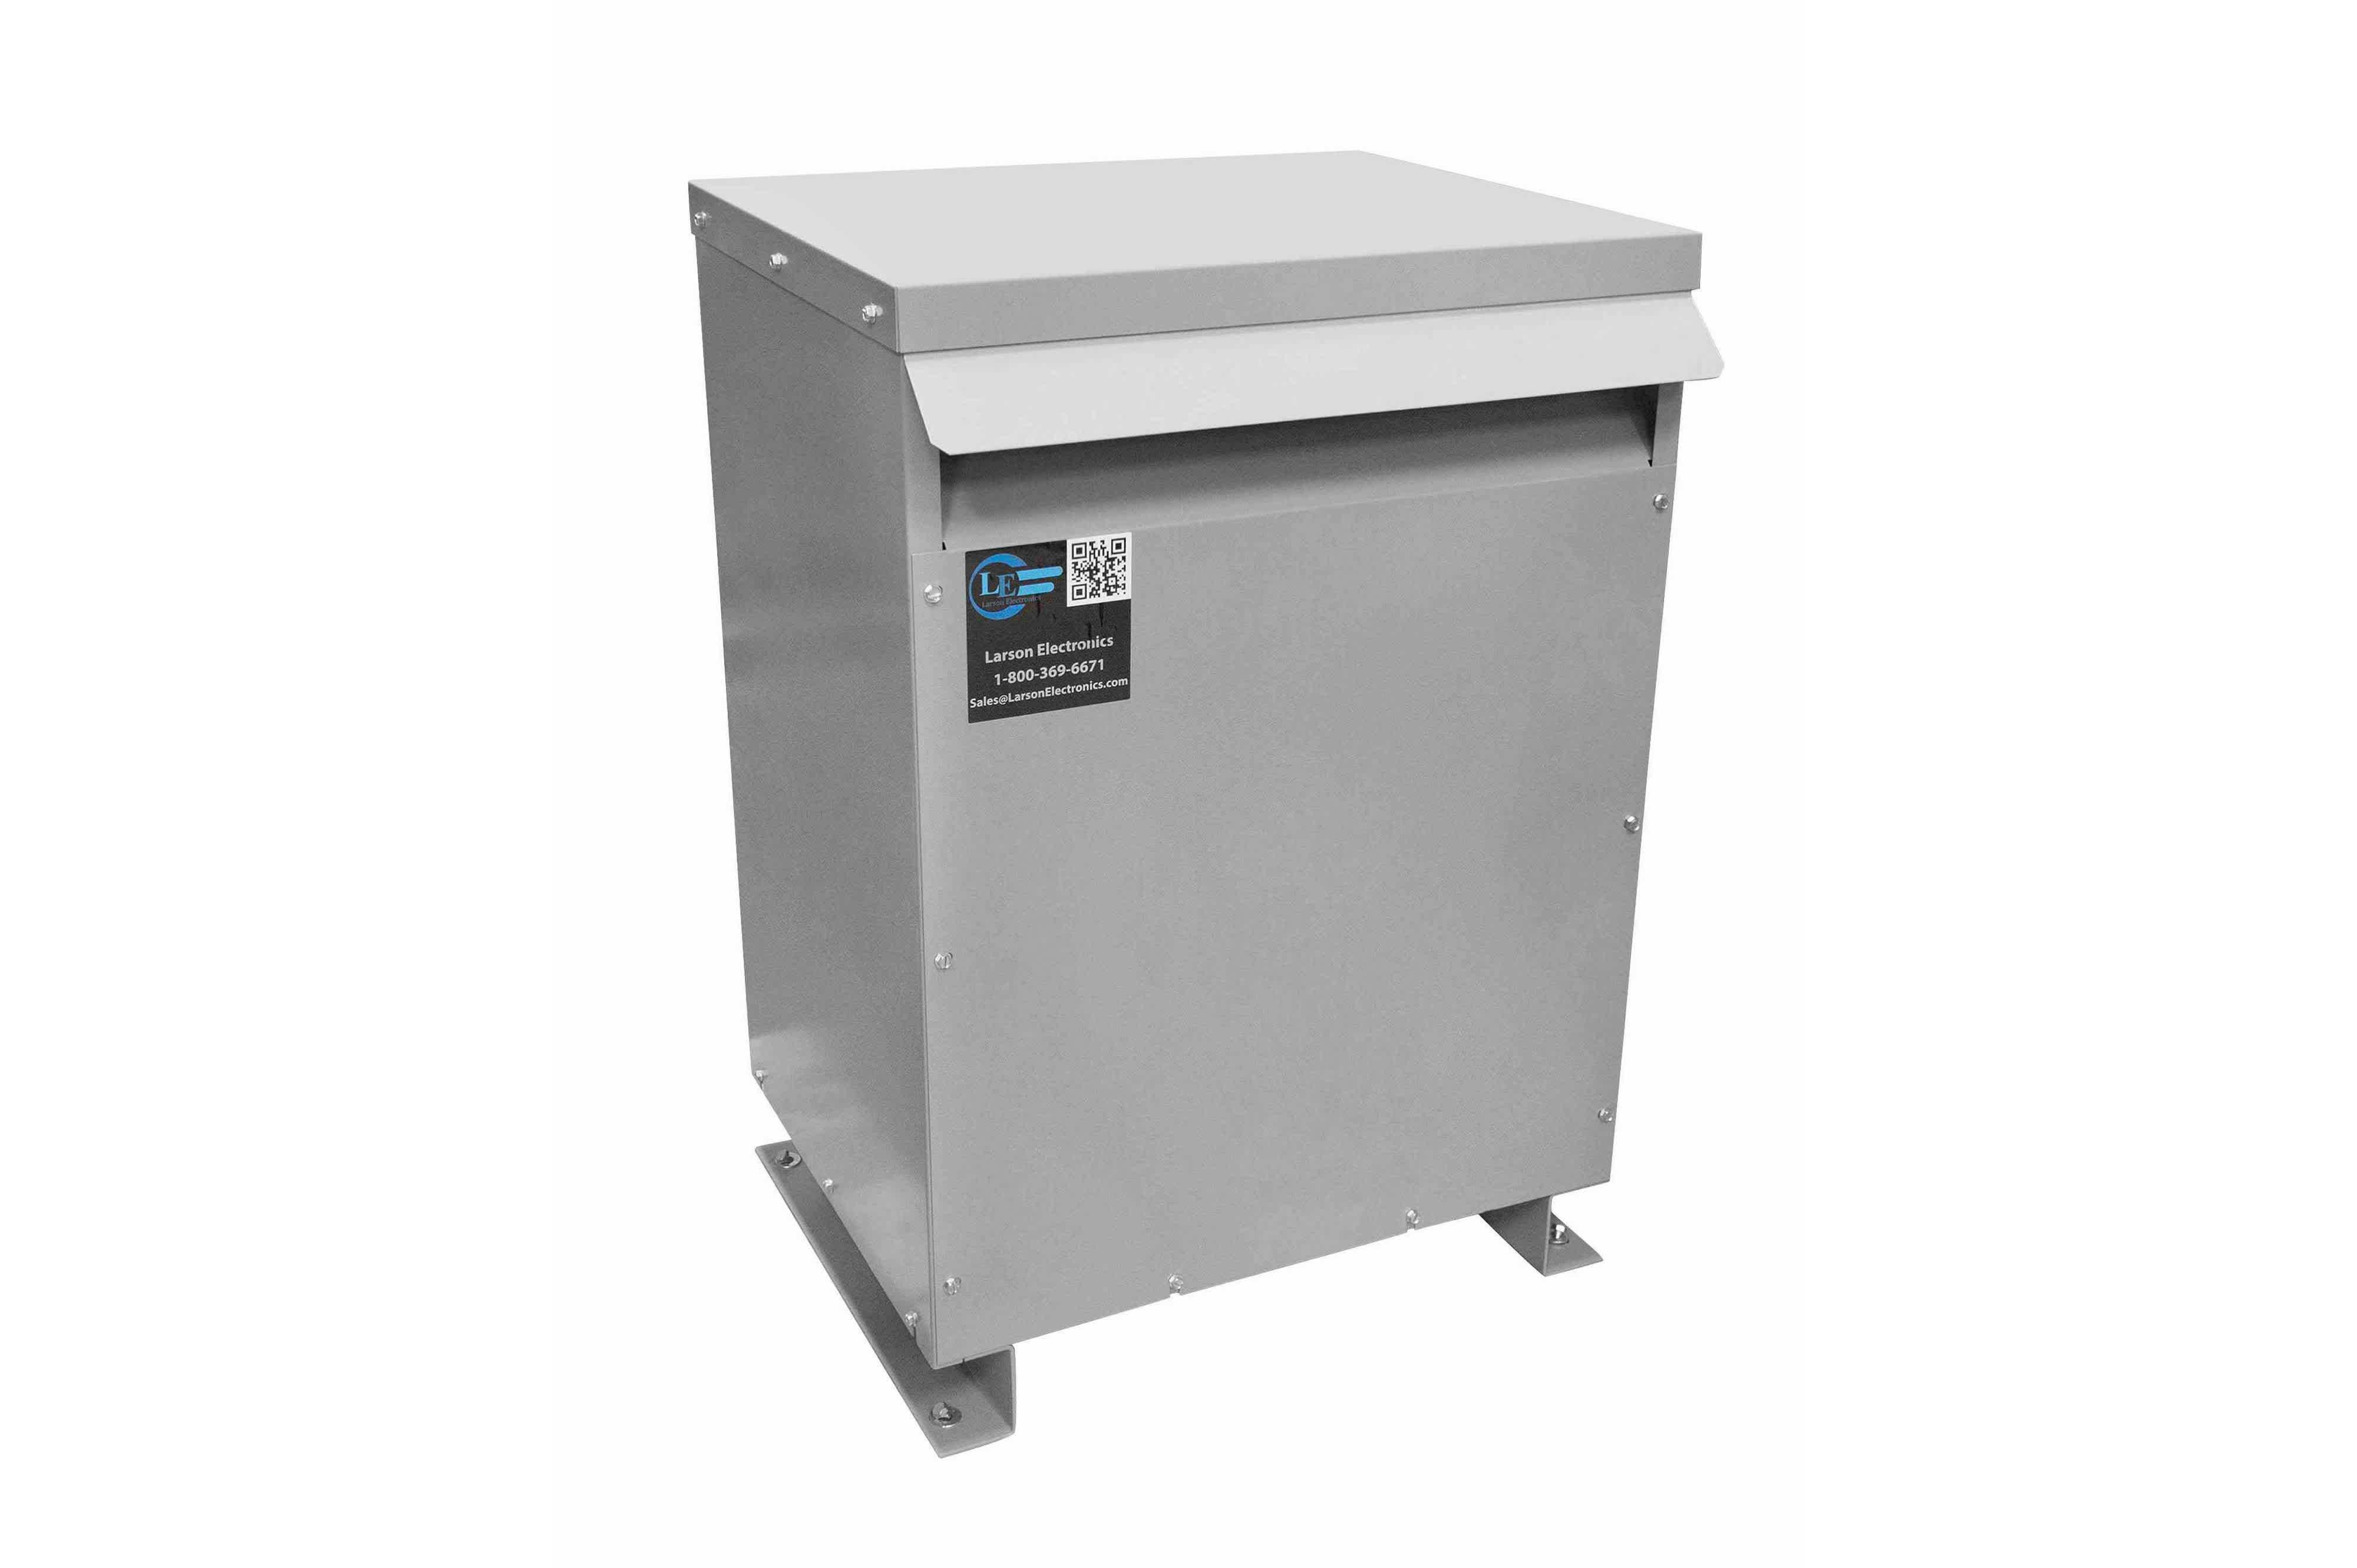 800 kVA 3PH DOE Transformer, 240V Delta Primary, 415Y/240 Wye-N Secondary, N3R, Ventilated, 60 Hz